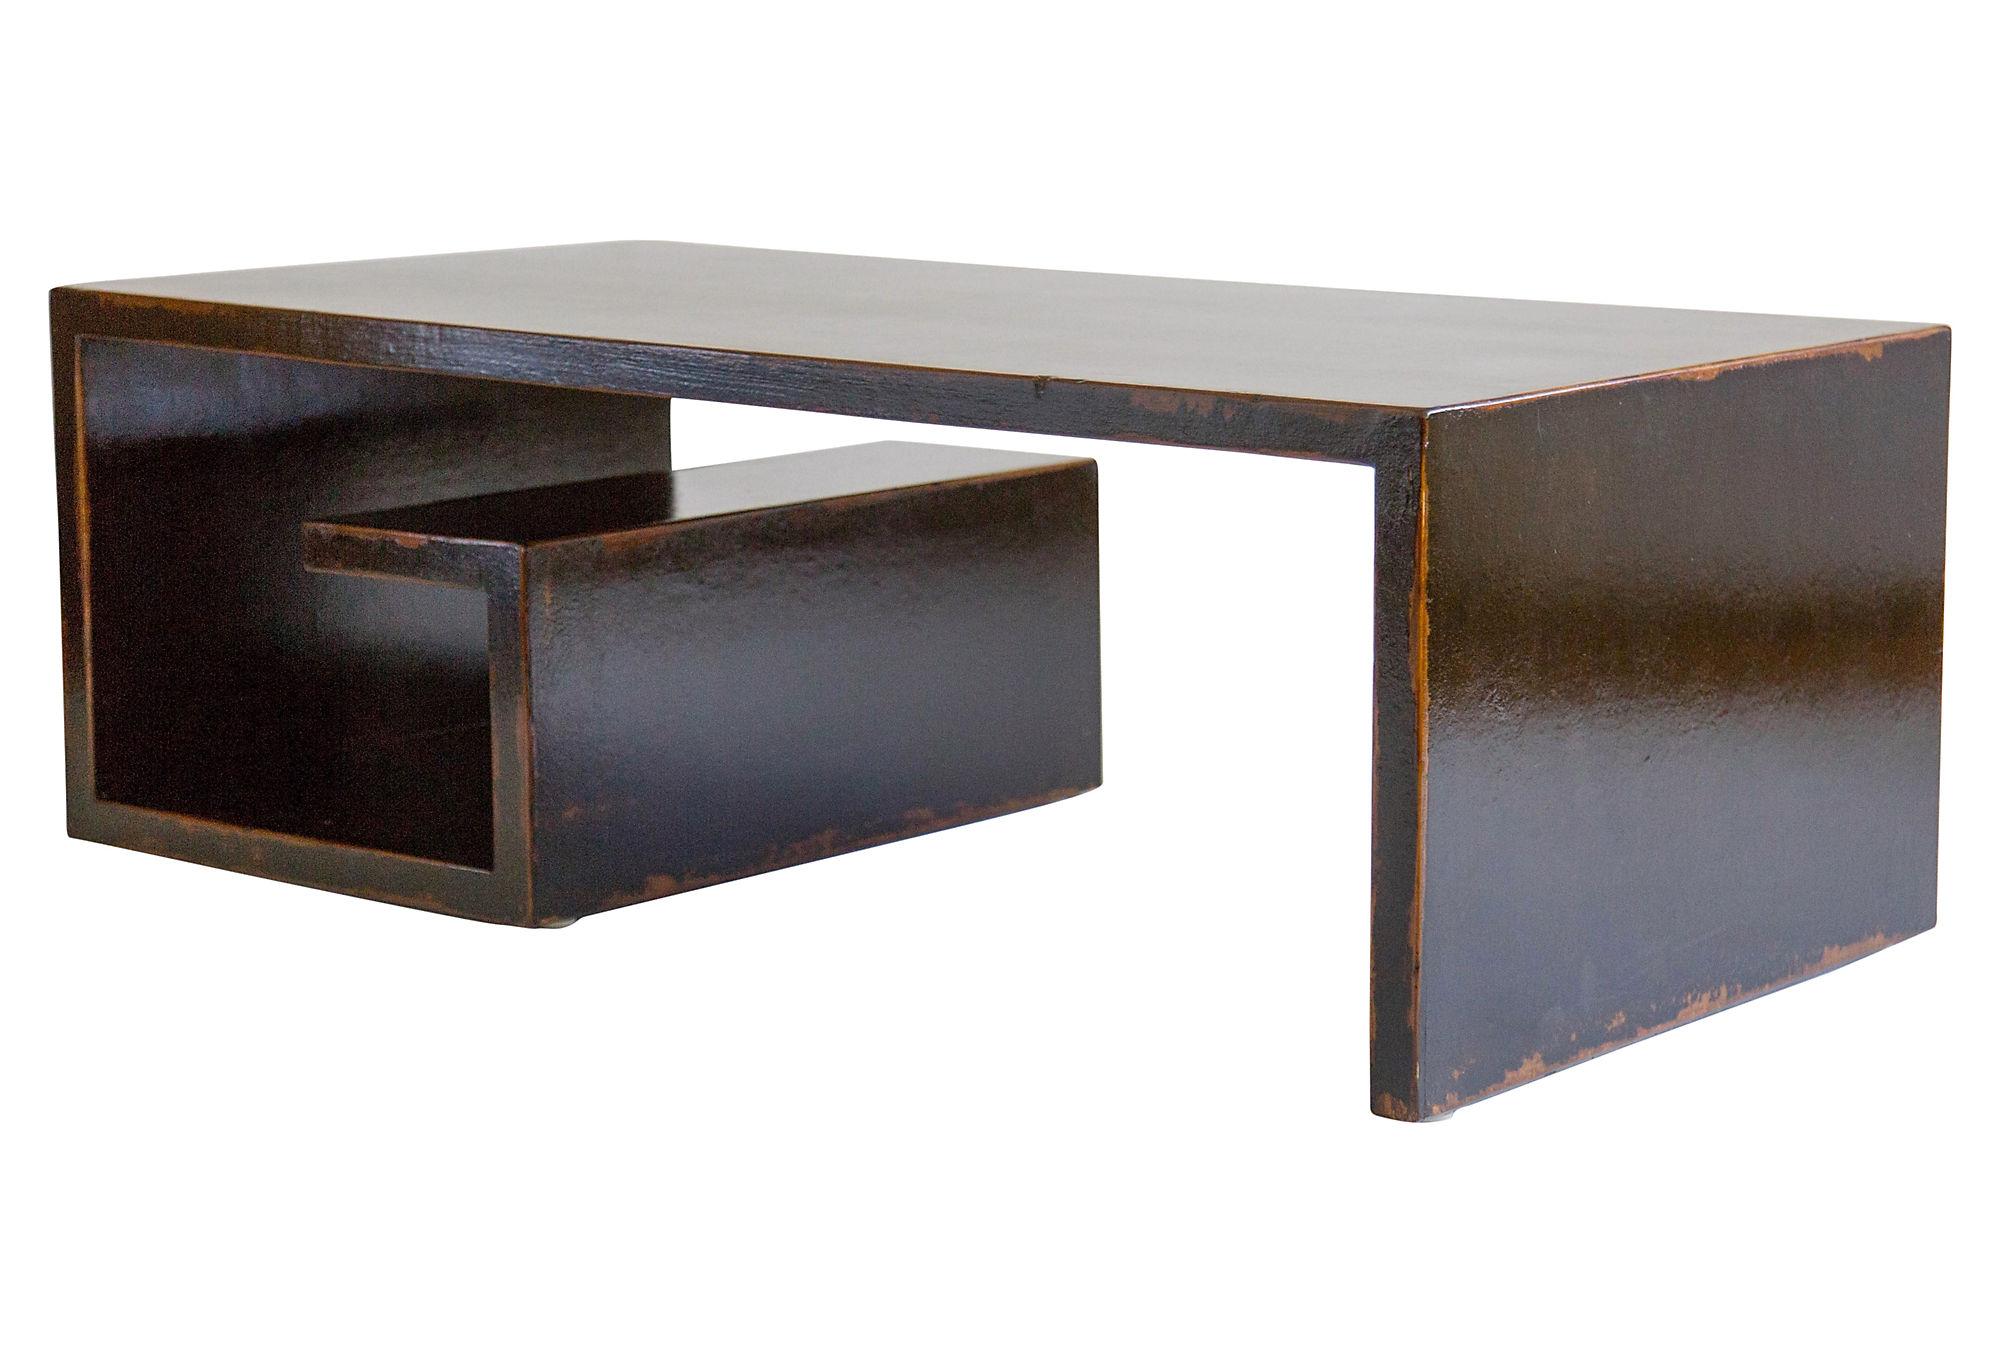 Hayes coffee table by west elm havenly ebony greek key coffee table geotapseo Gallery